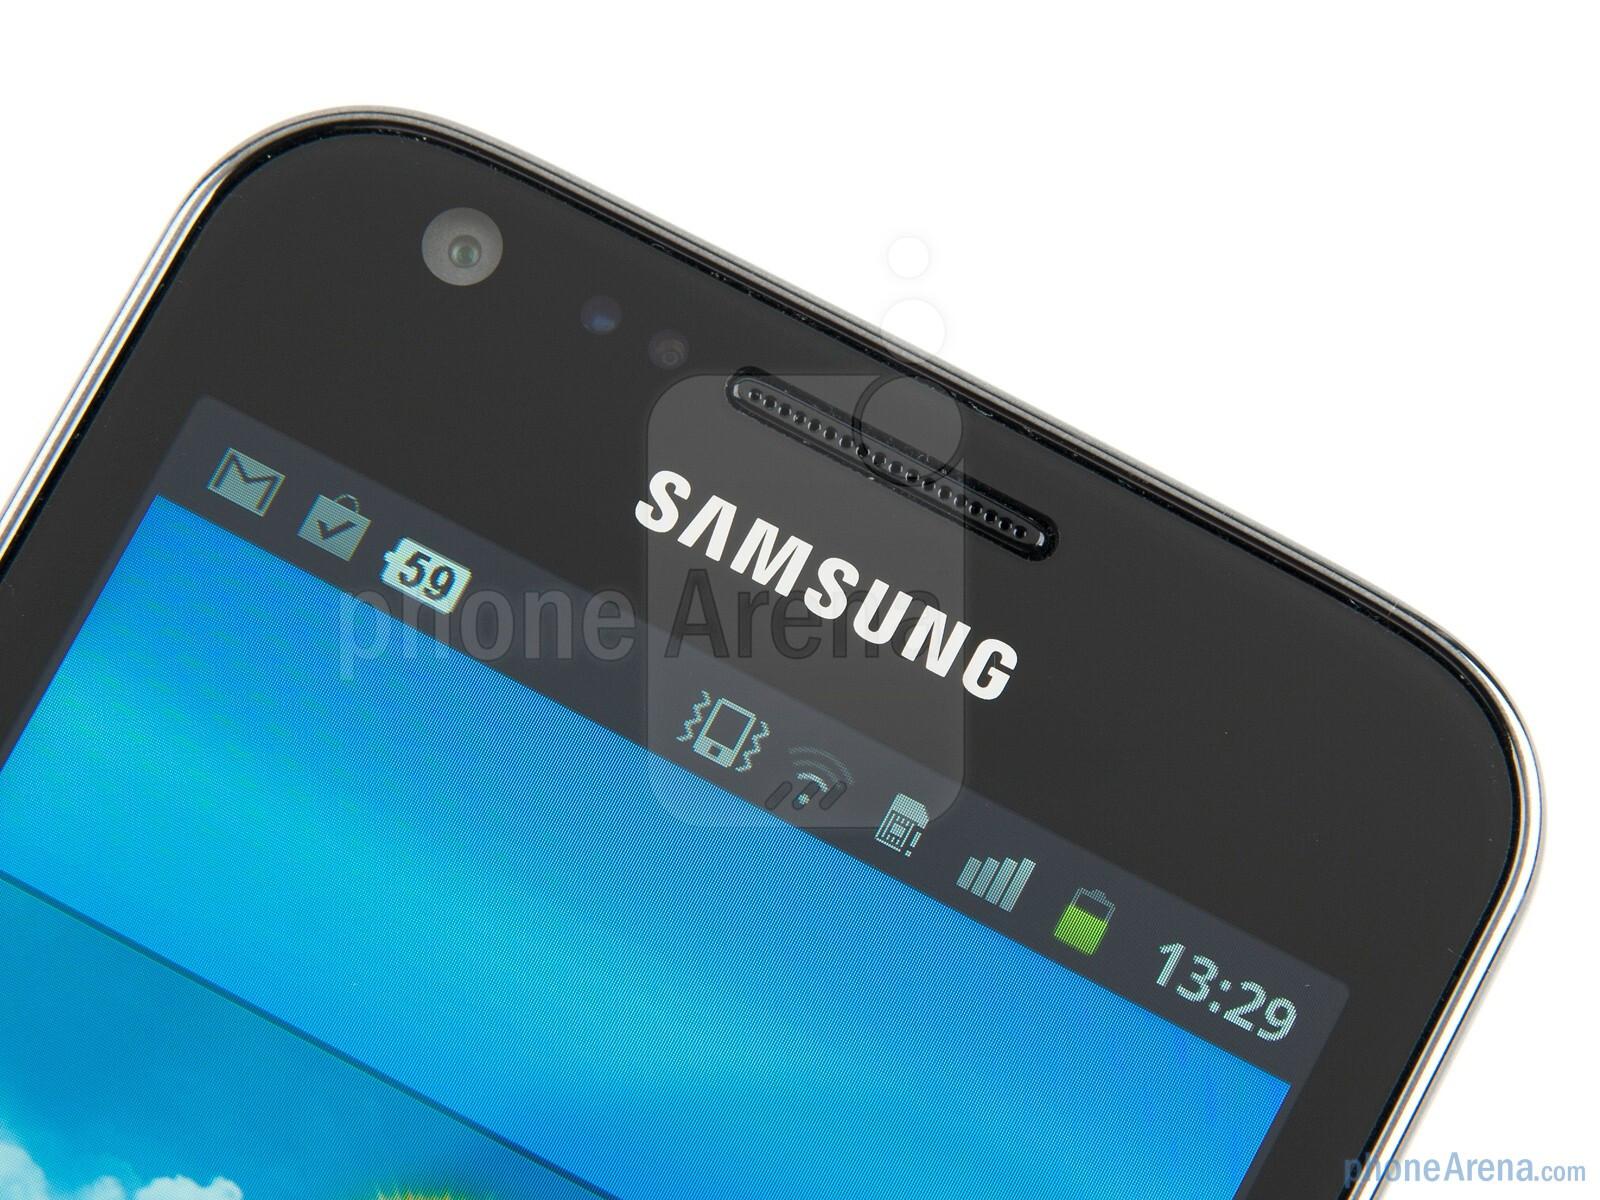 Samsung Galaxy R Preview - PhoneArena